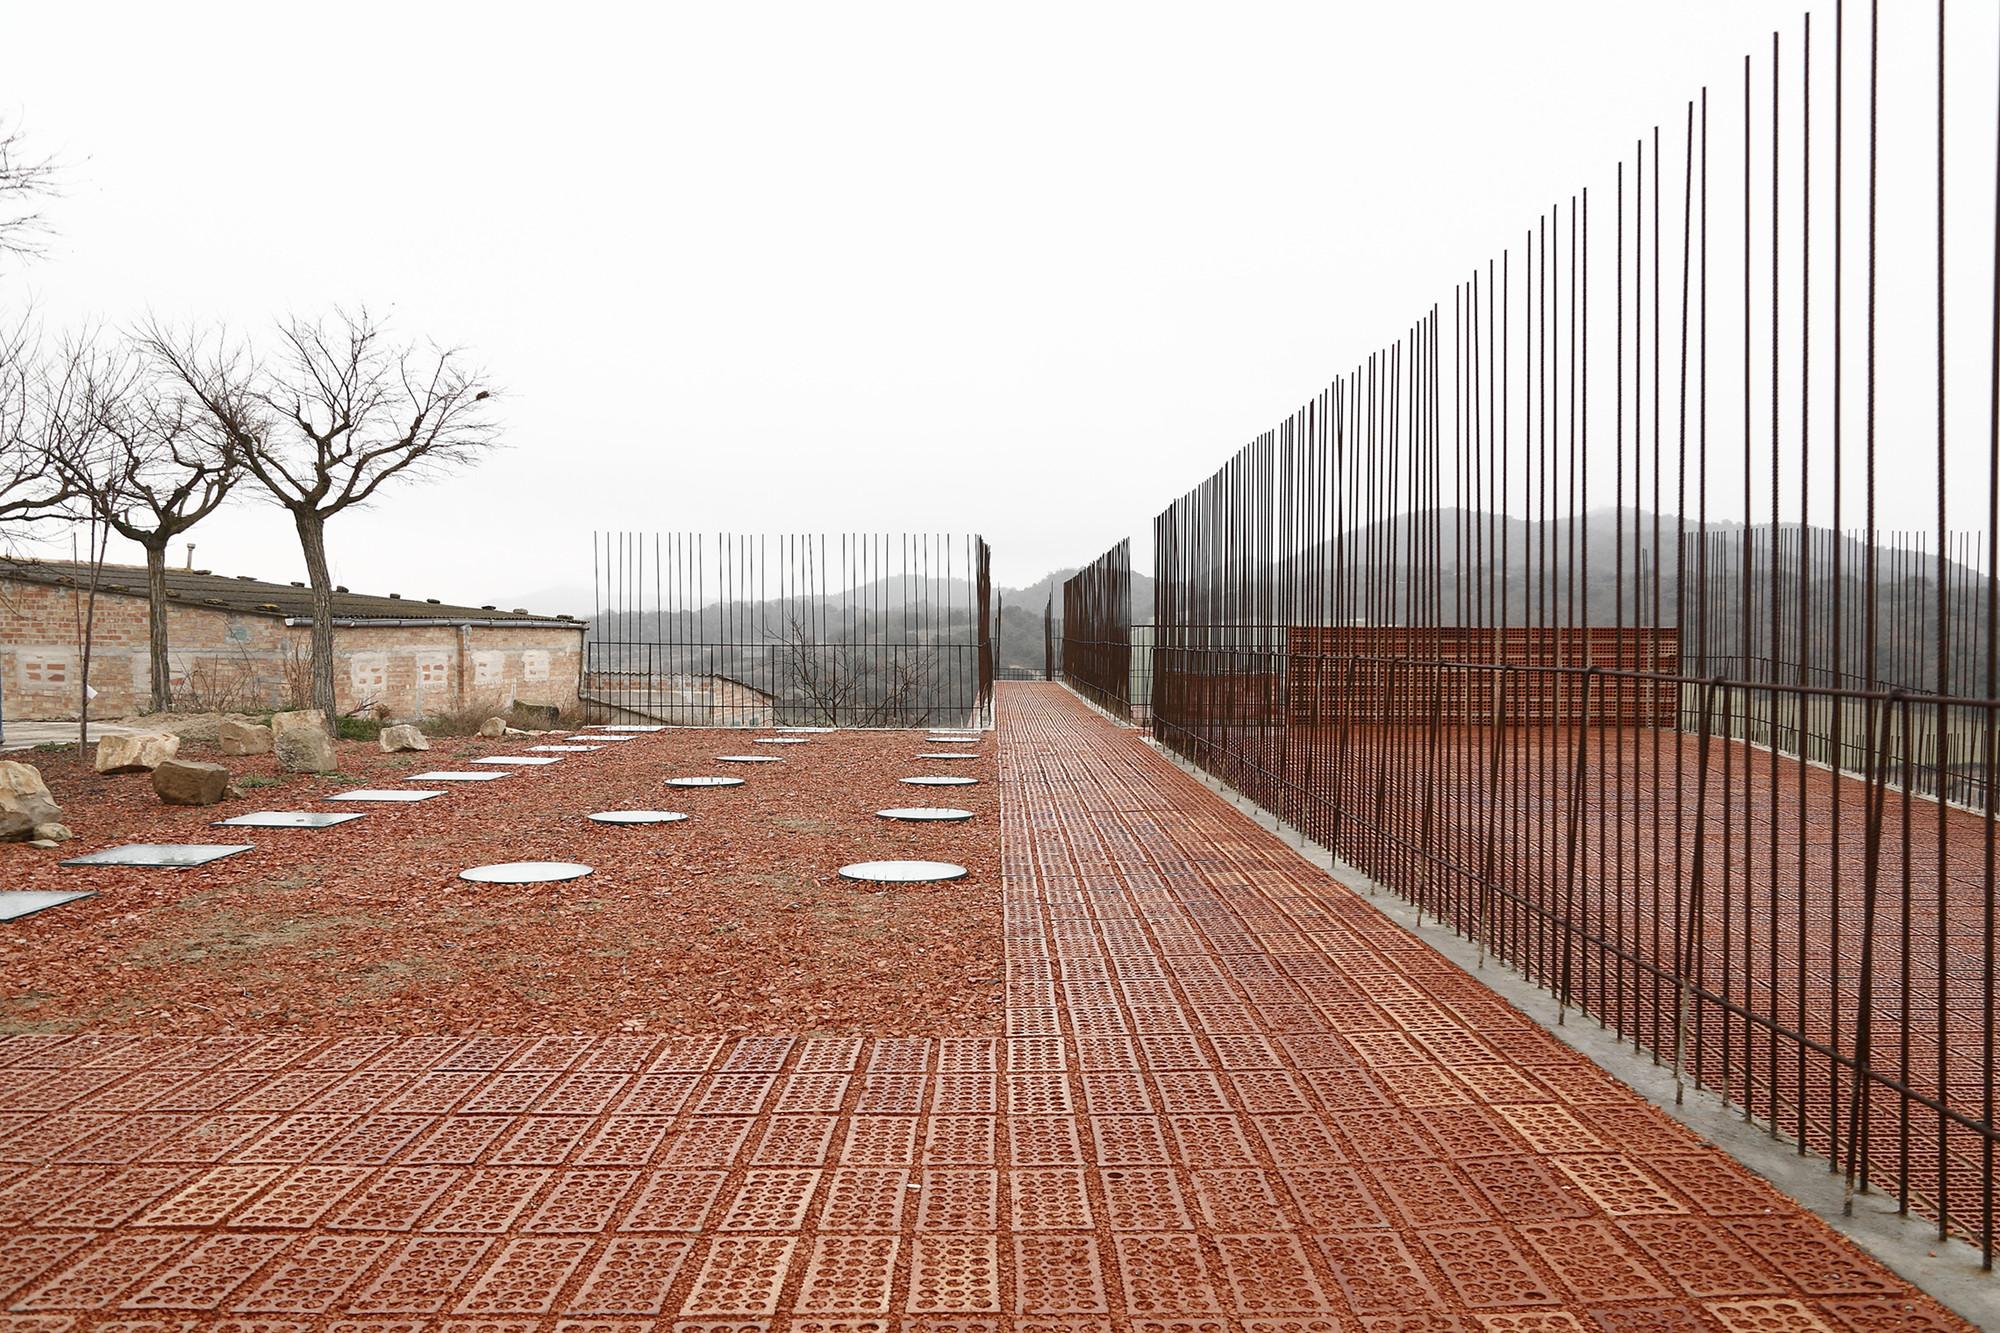 Espaço Transmissor do Túmulo | Dolmen Megalítico De Seró / Estudi D'arquitectura Toni Gironès, © Aitor Estevez